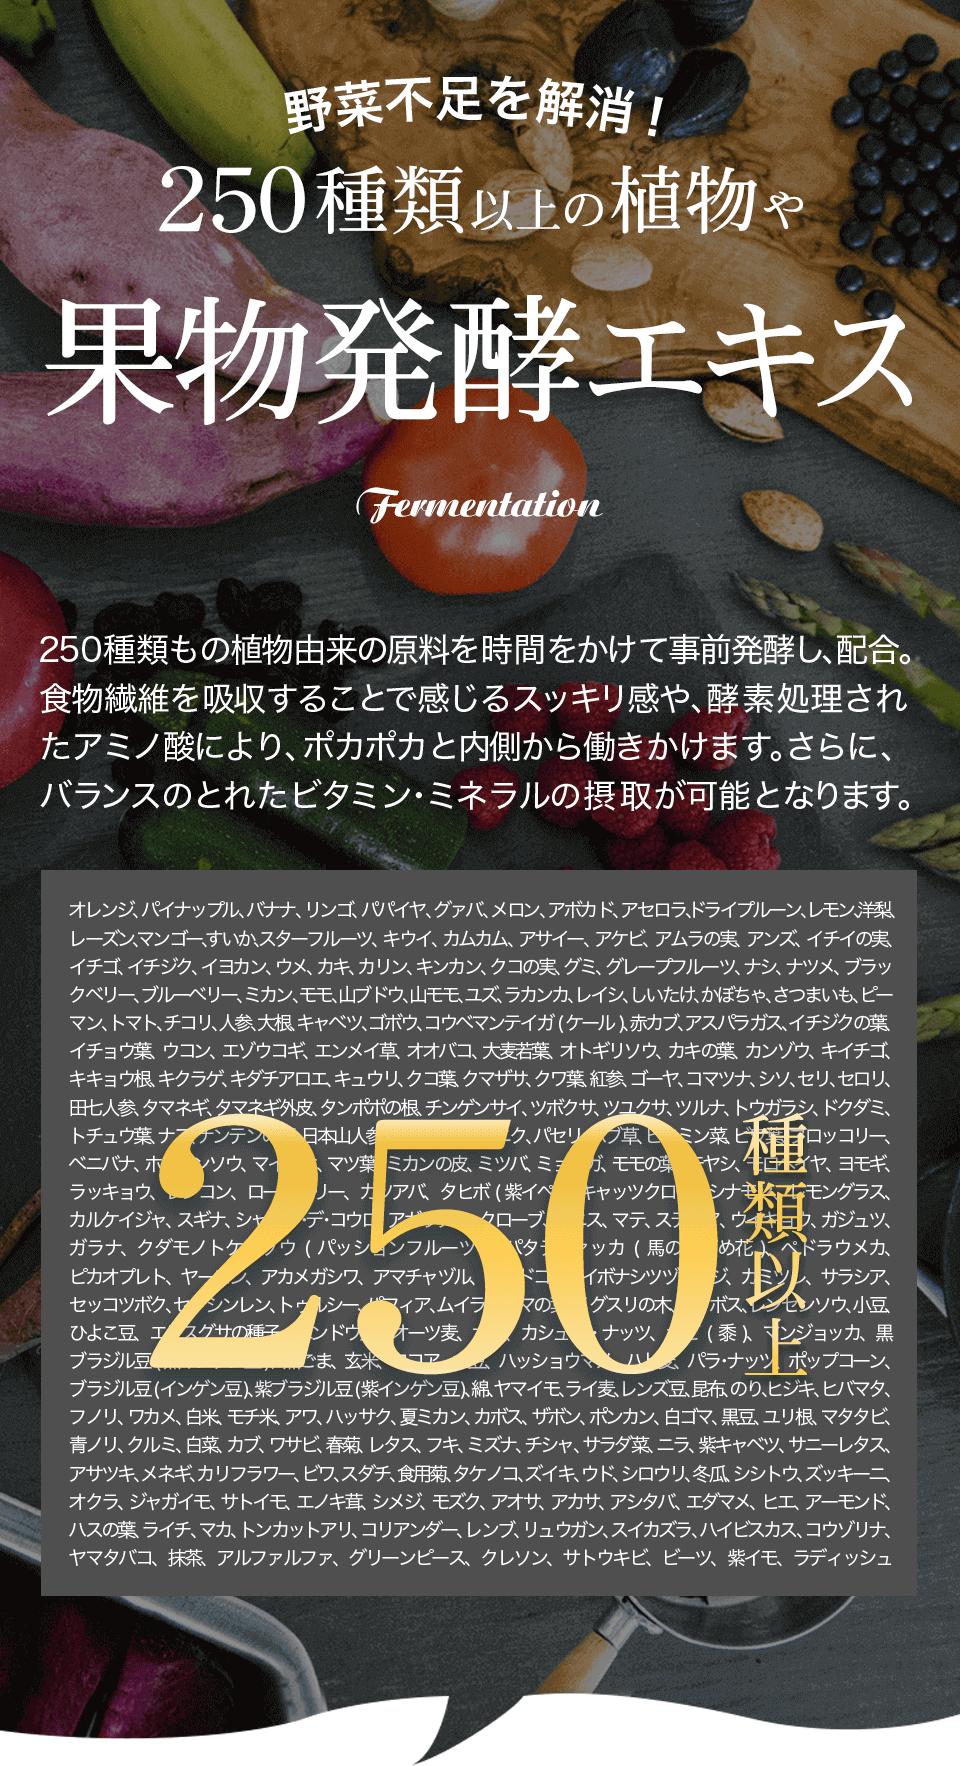 KUROJIRUの成分4